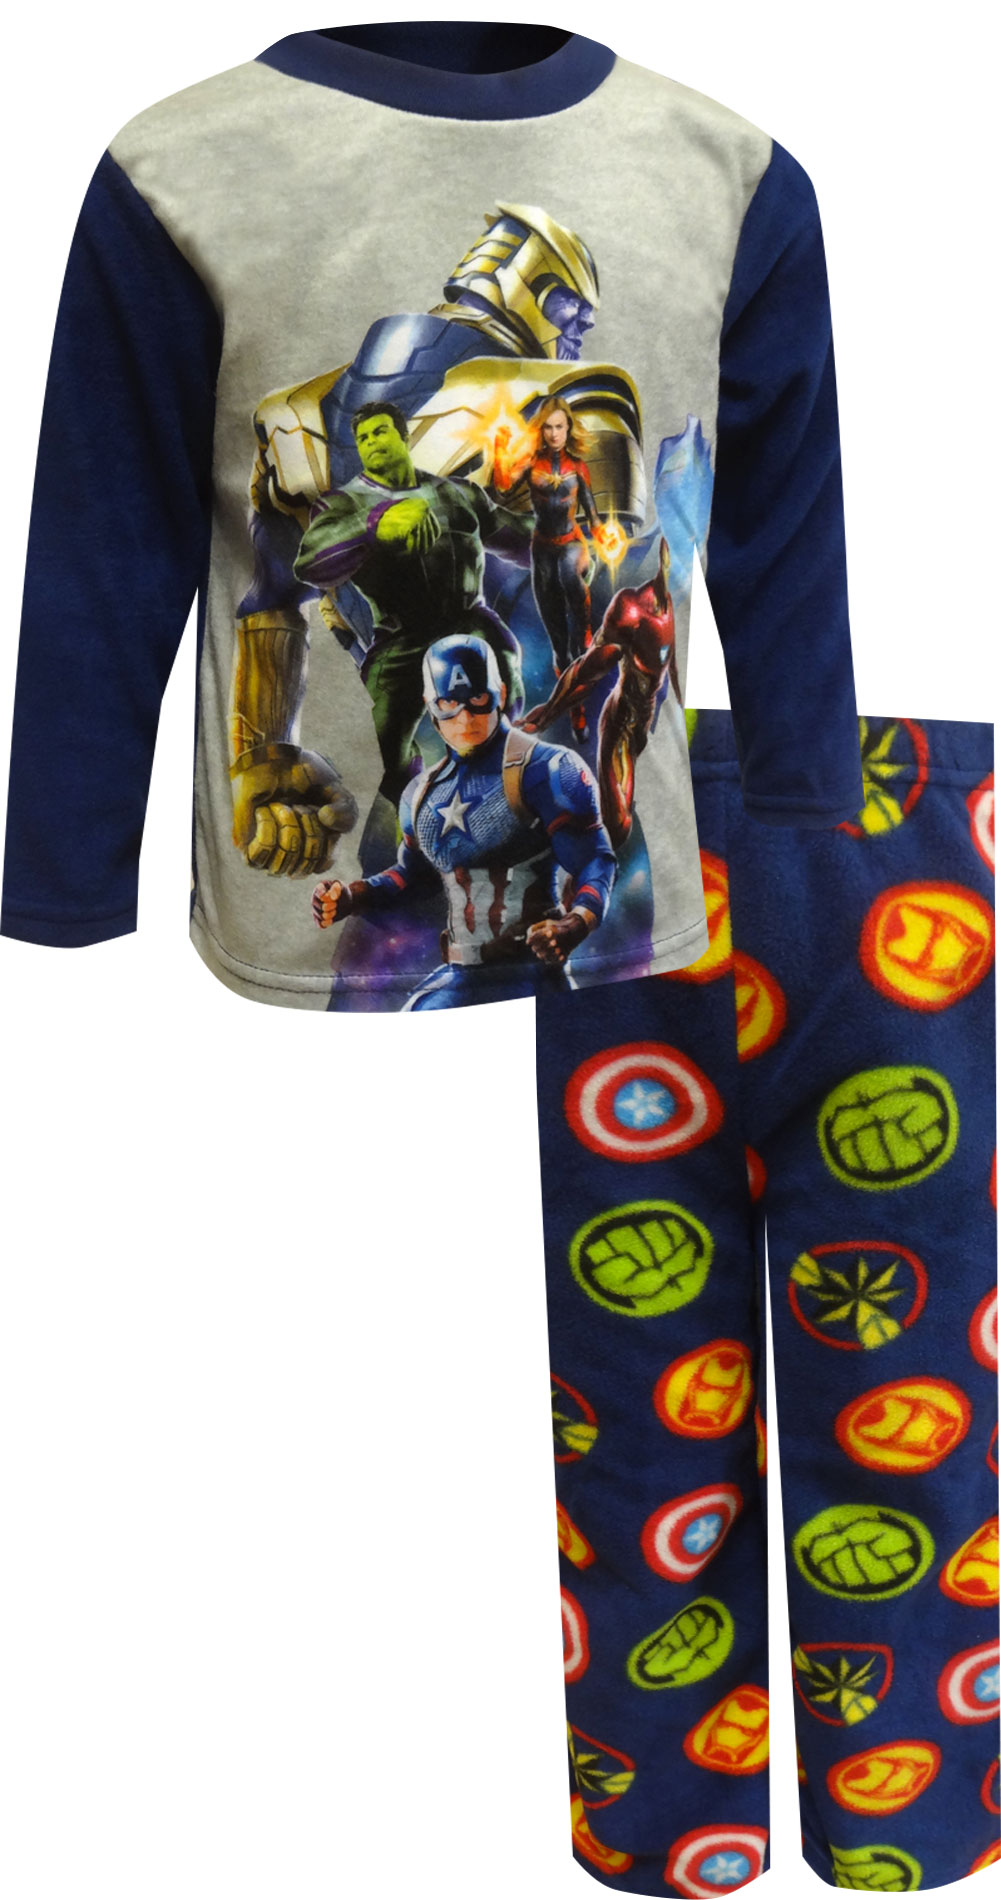 Image of Marvel Comics Thanos VS The Avengers Fleece Pajamas for boys